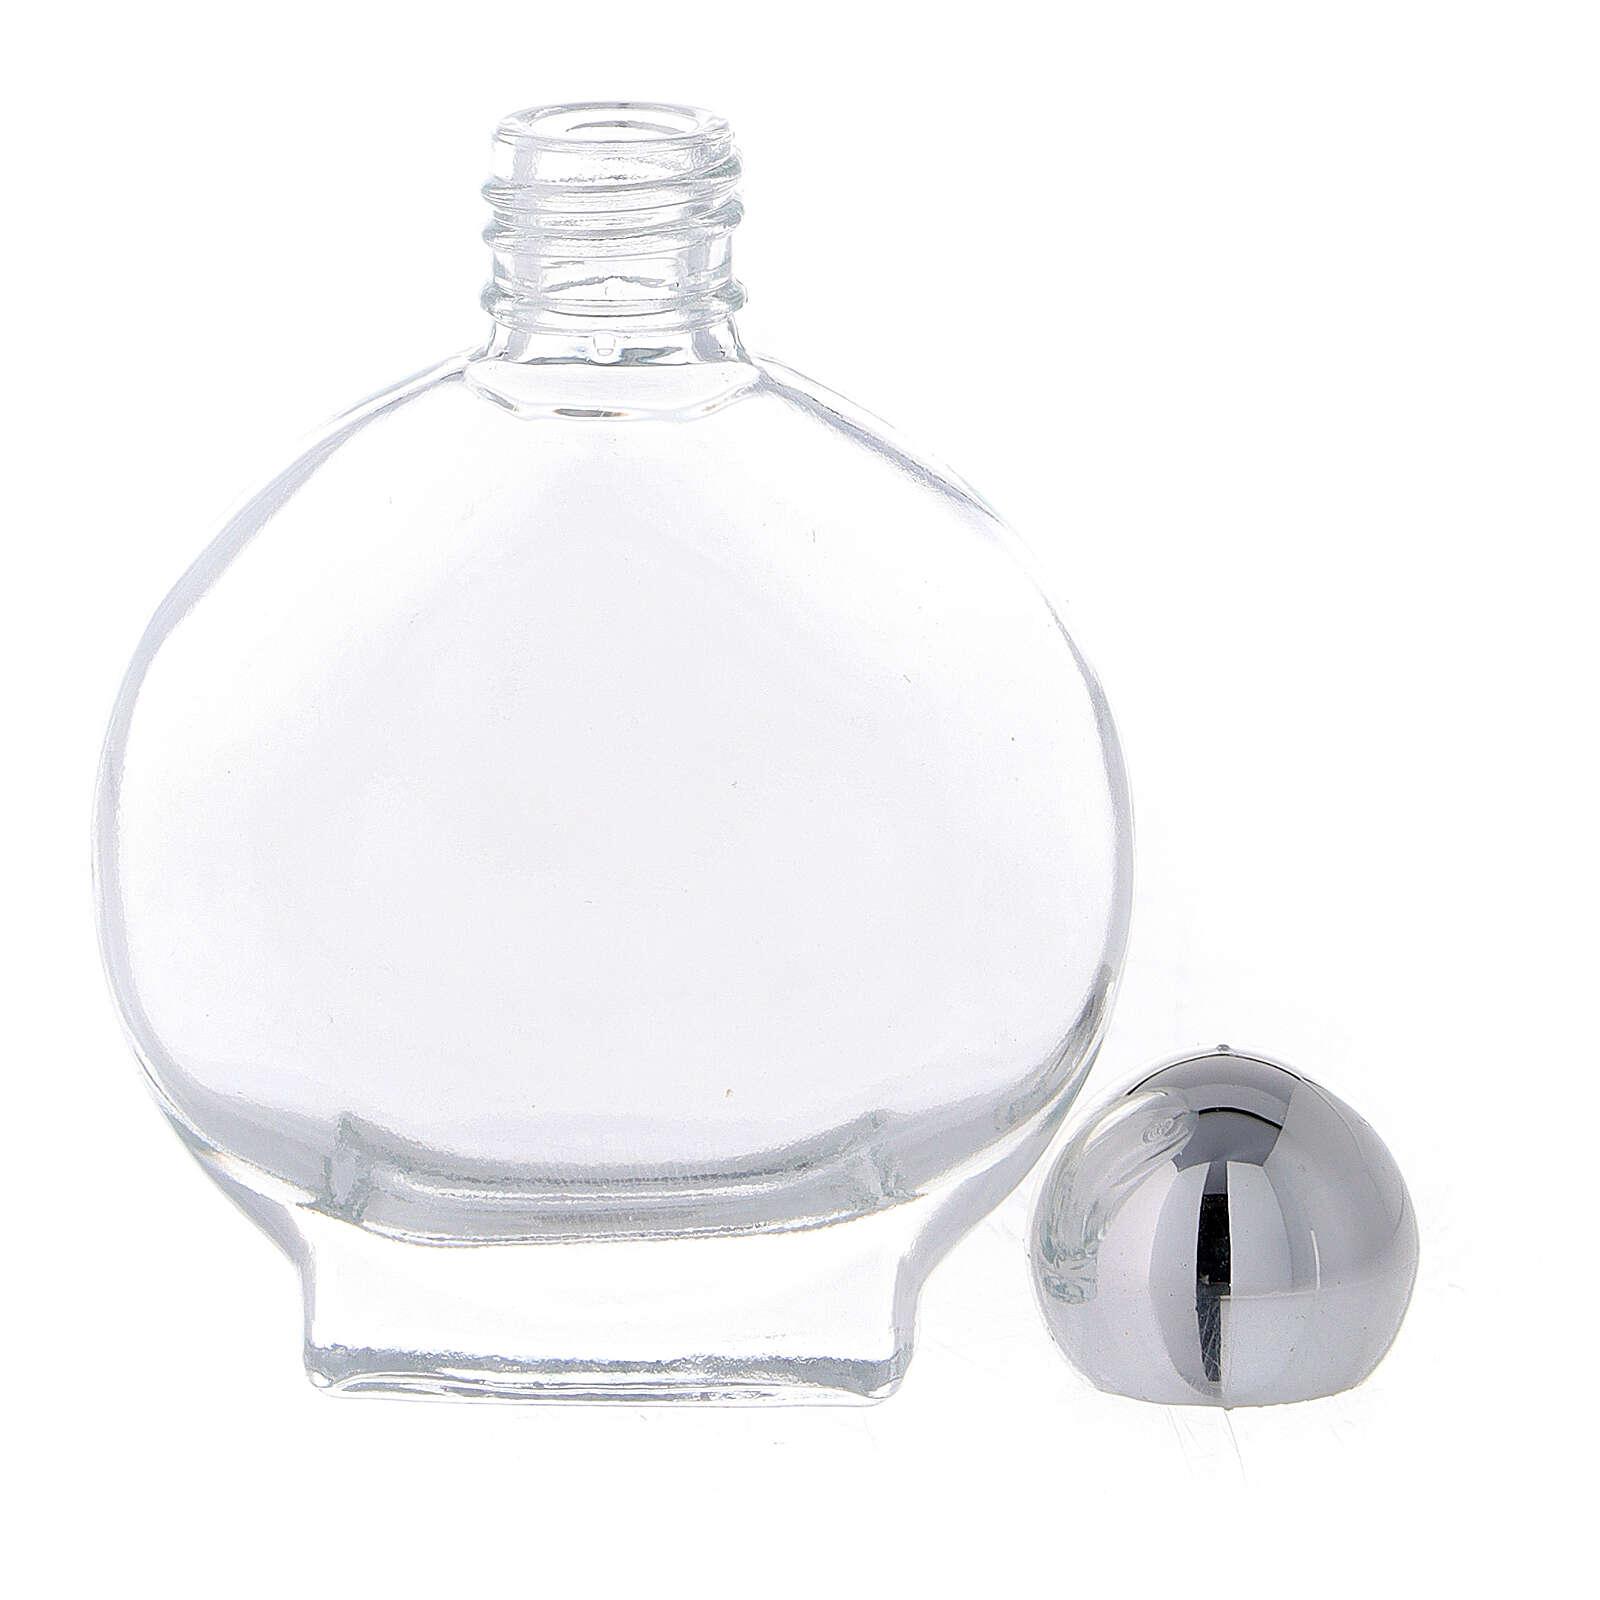 Bottiglietta 15 ml per acquasanta vetro (CONF. 50 PZ) 3